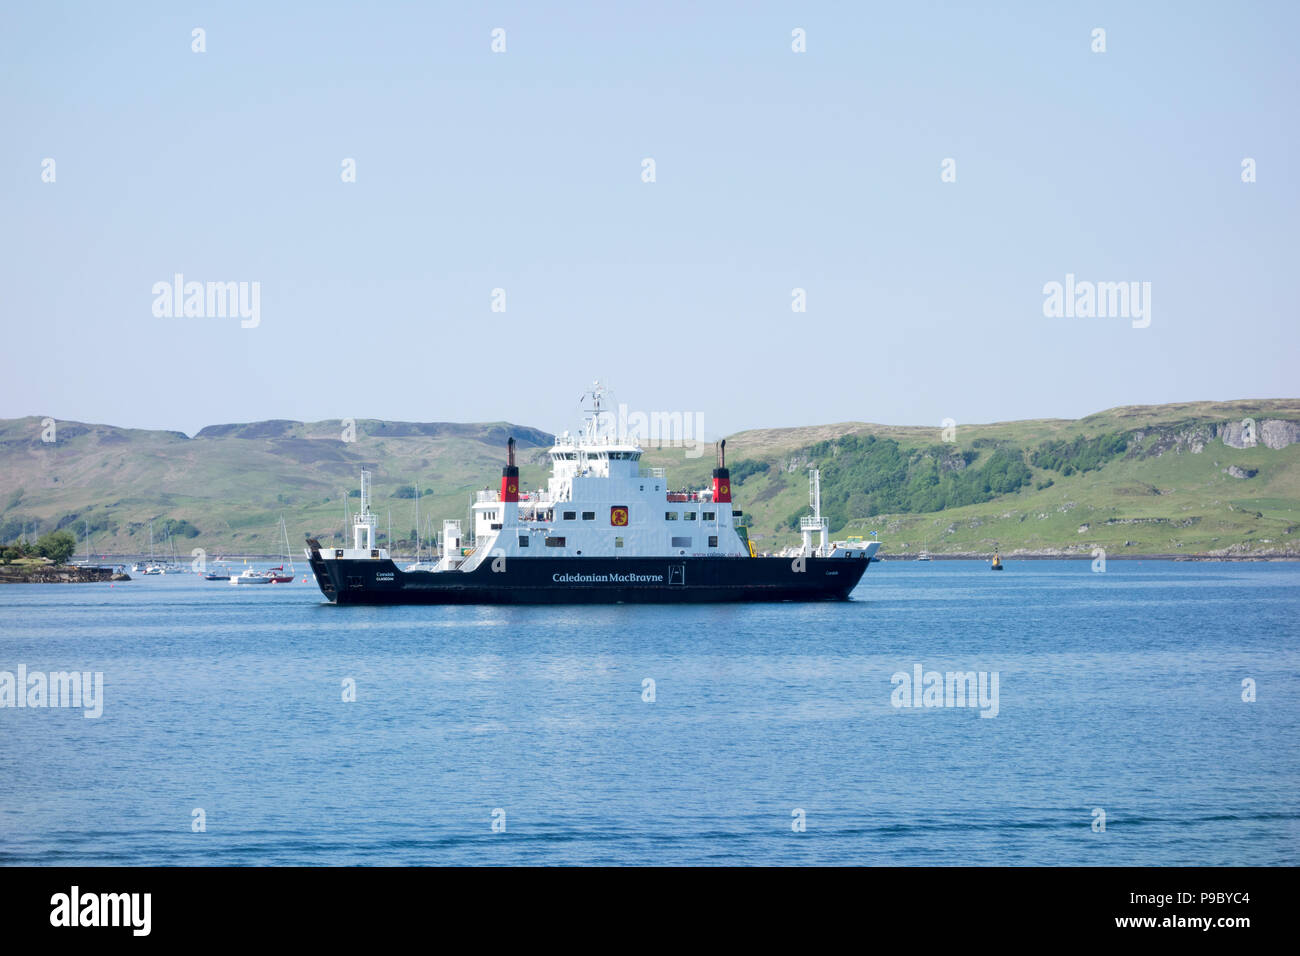 Caledonian Macbrayne the MV Coruisk Ferry approaching Oban Harbour, West Coast of Scotland, United Kingdom Stock Photo